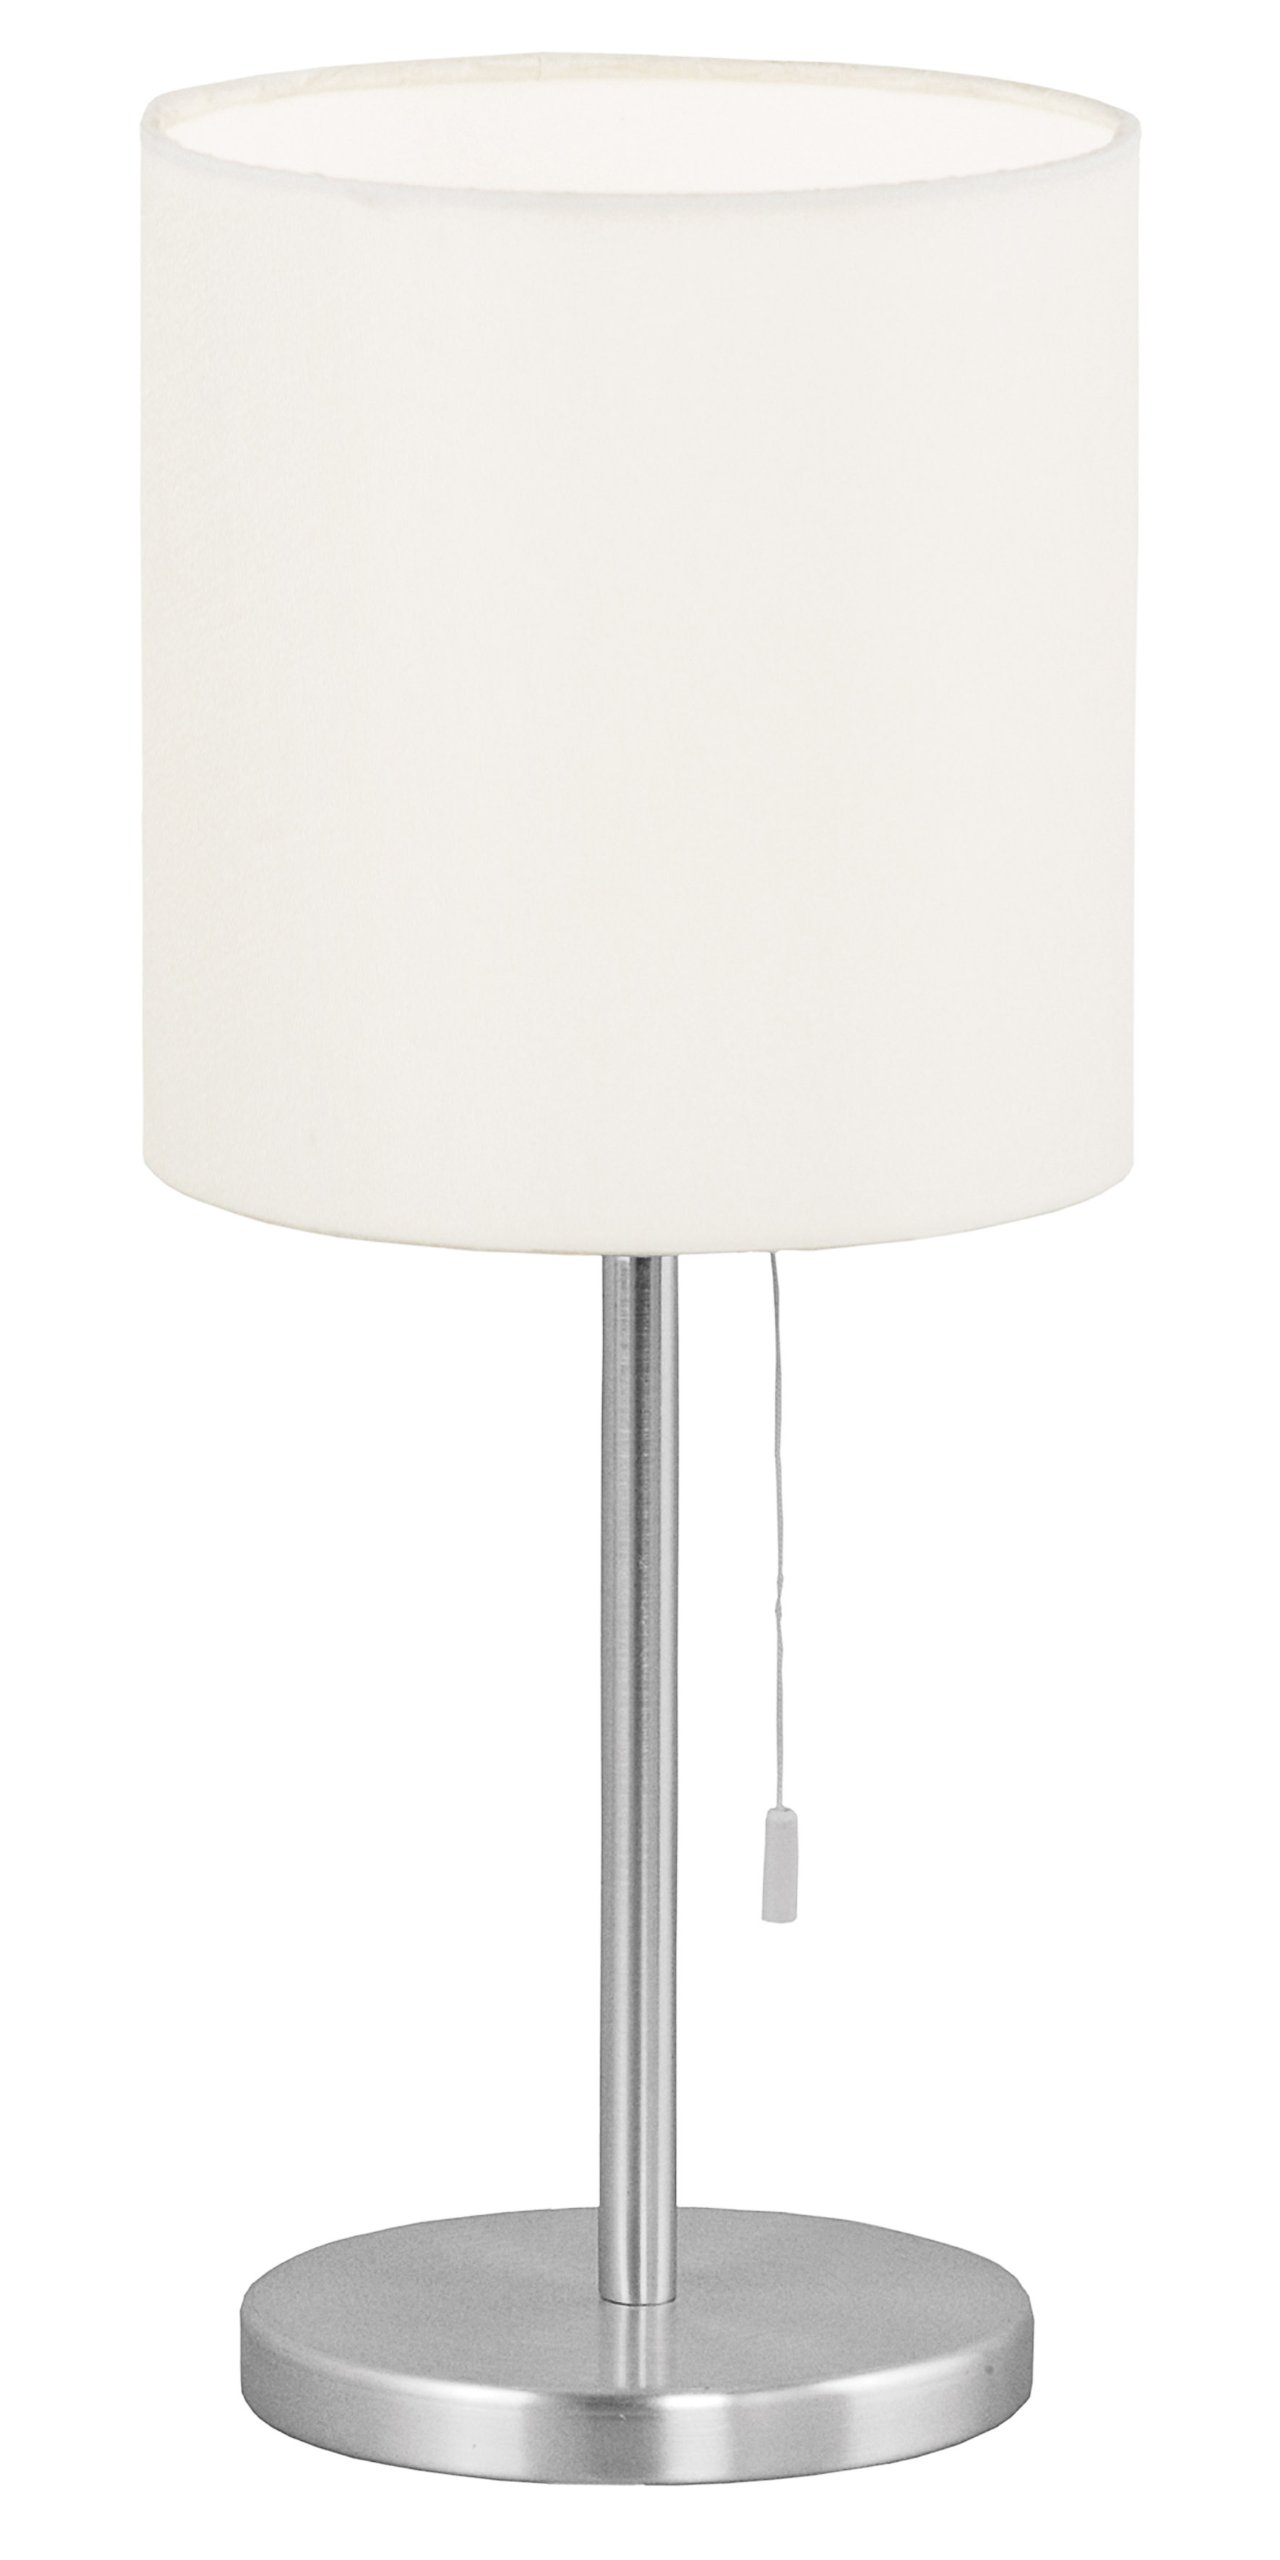 Eglo 82811A Sendo Table Lamp, Aluminum